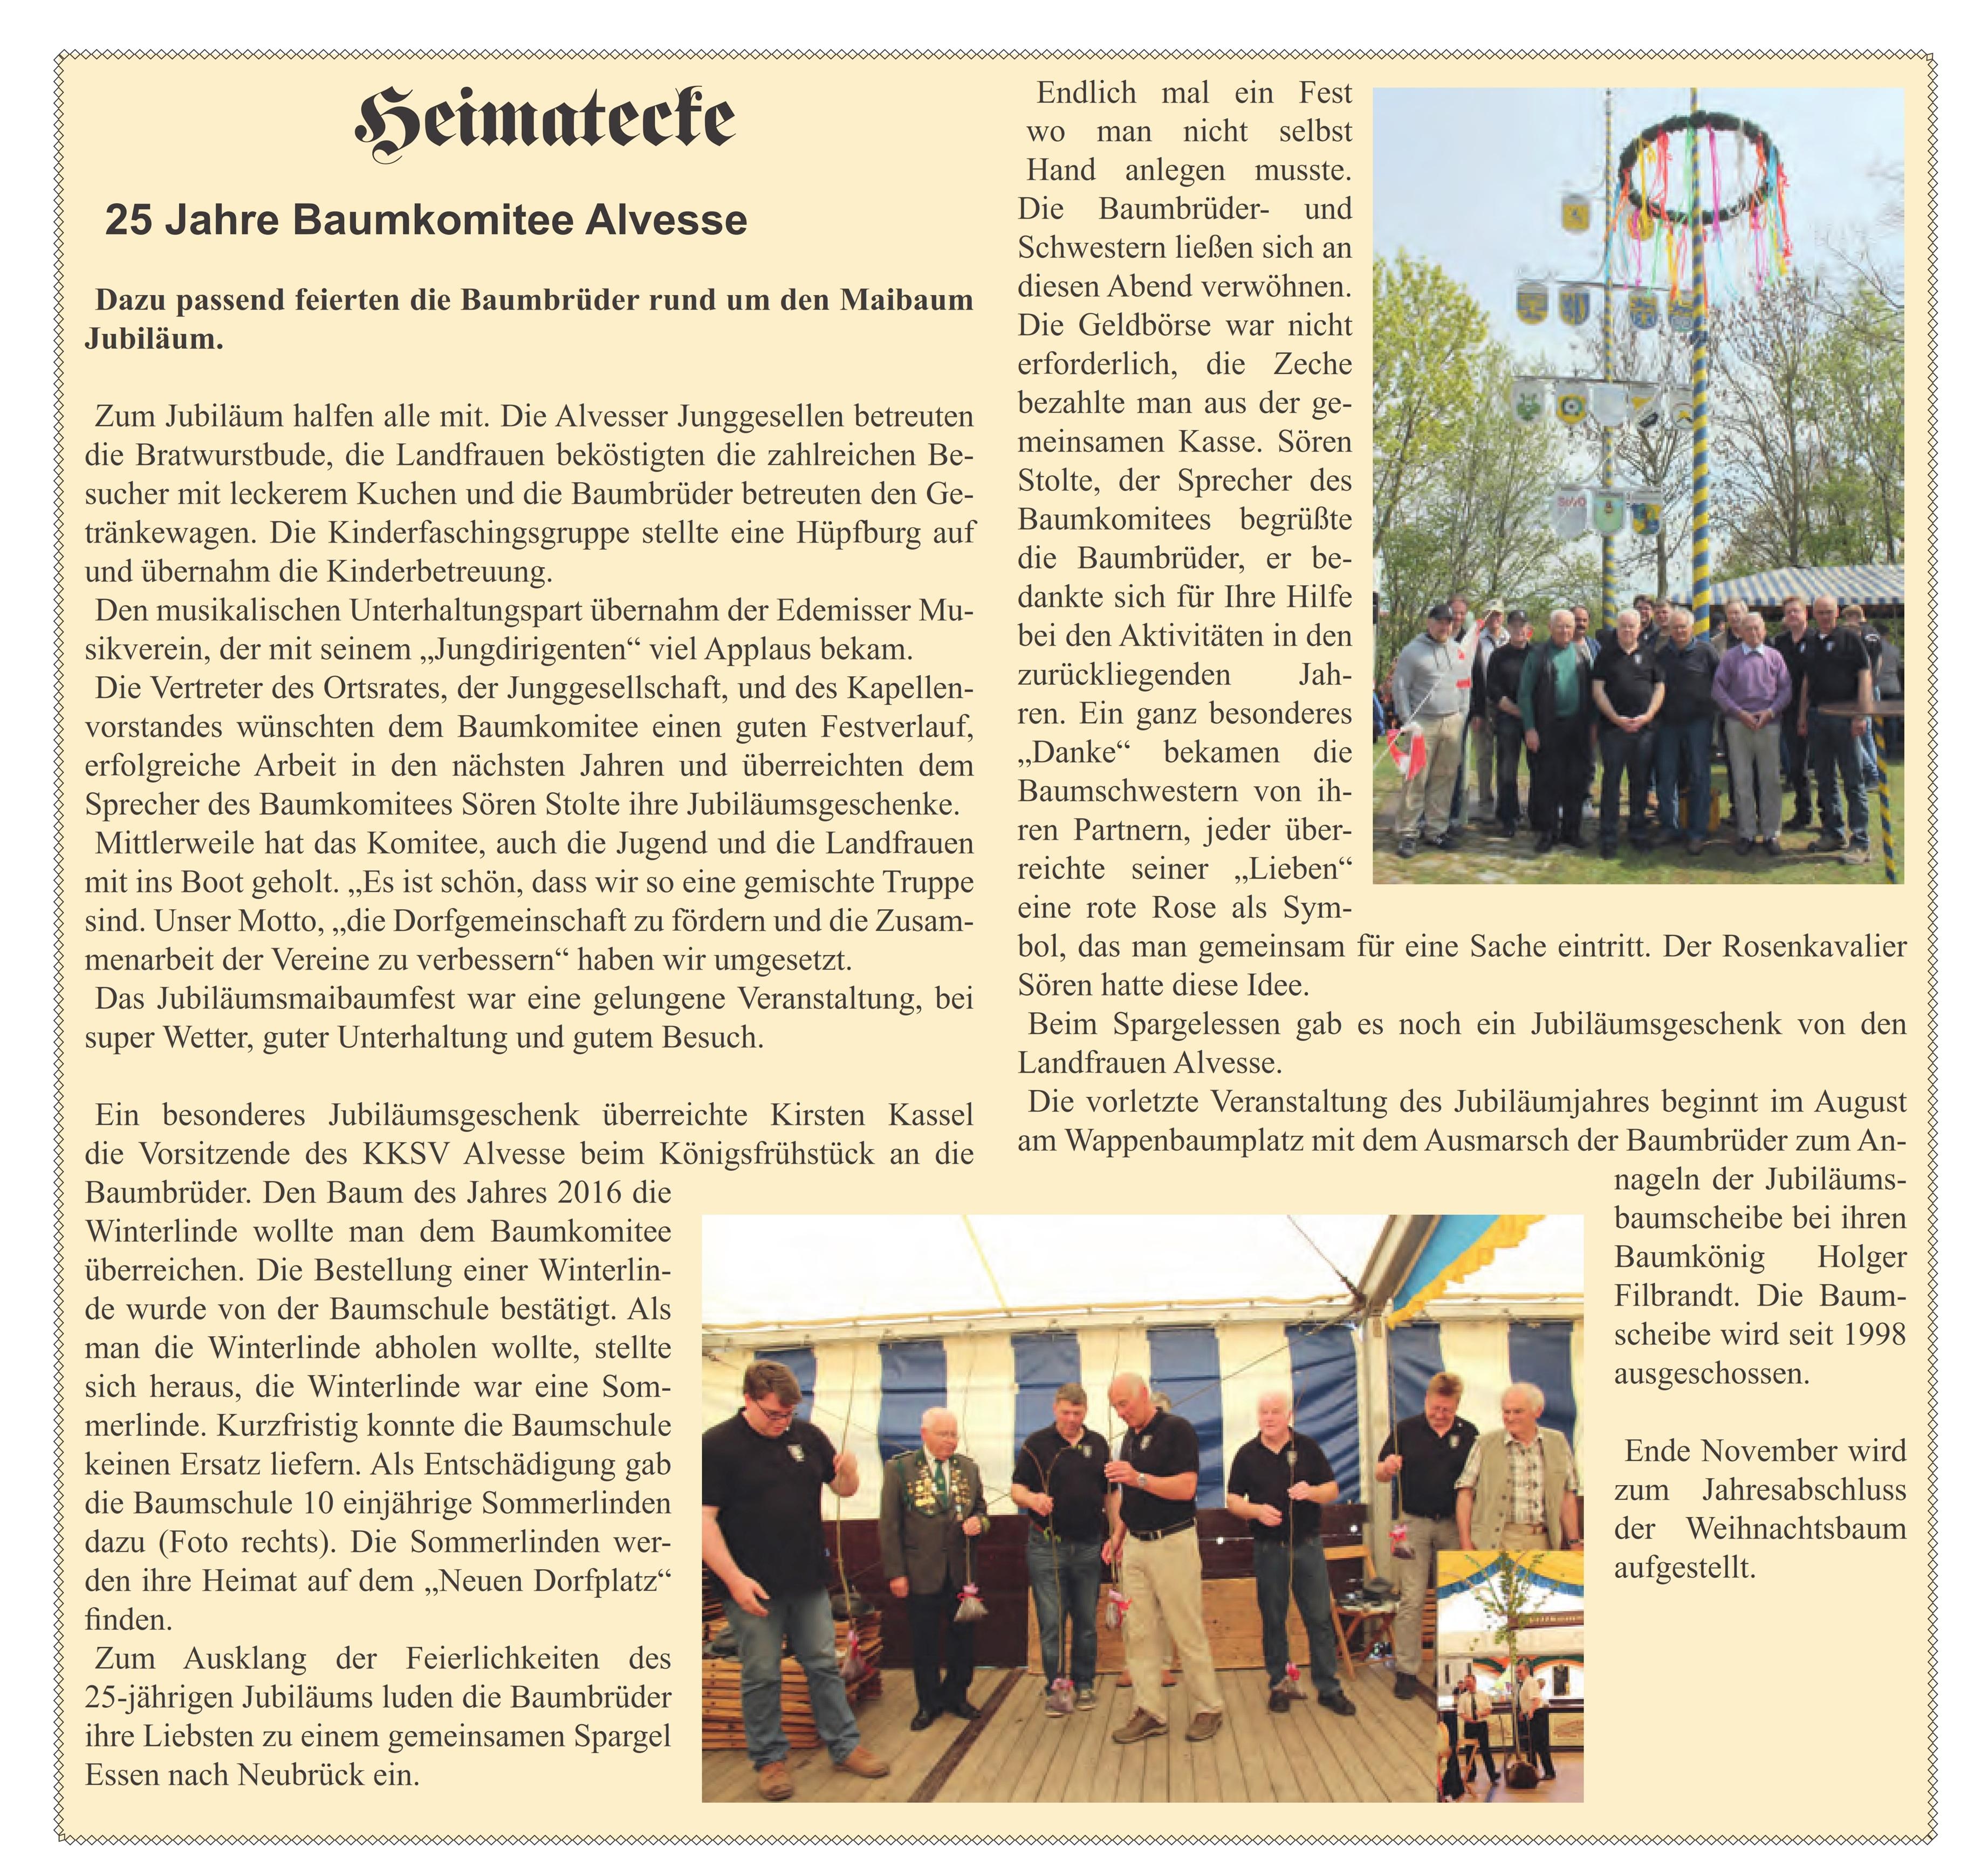 25 Jahre Baumkomitee Alvesse